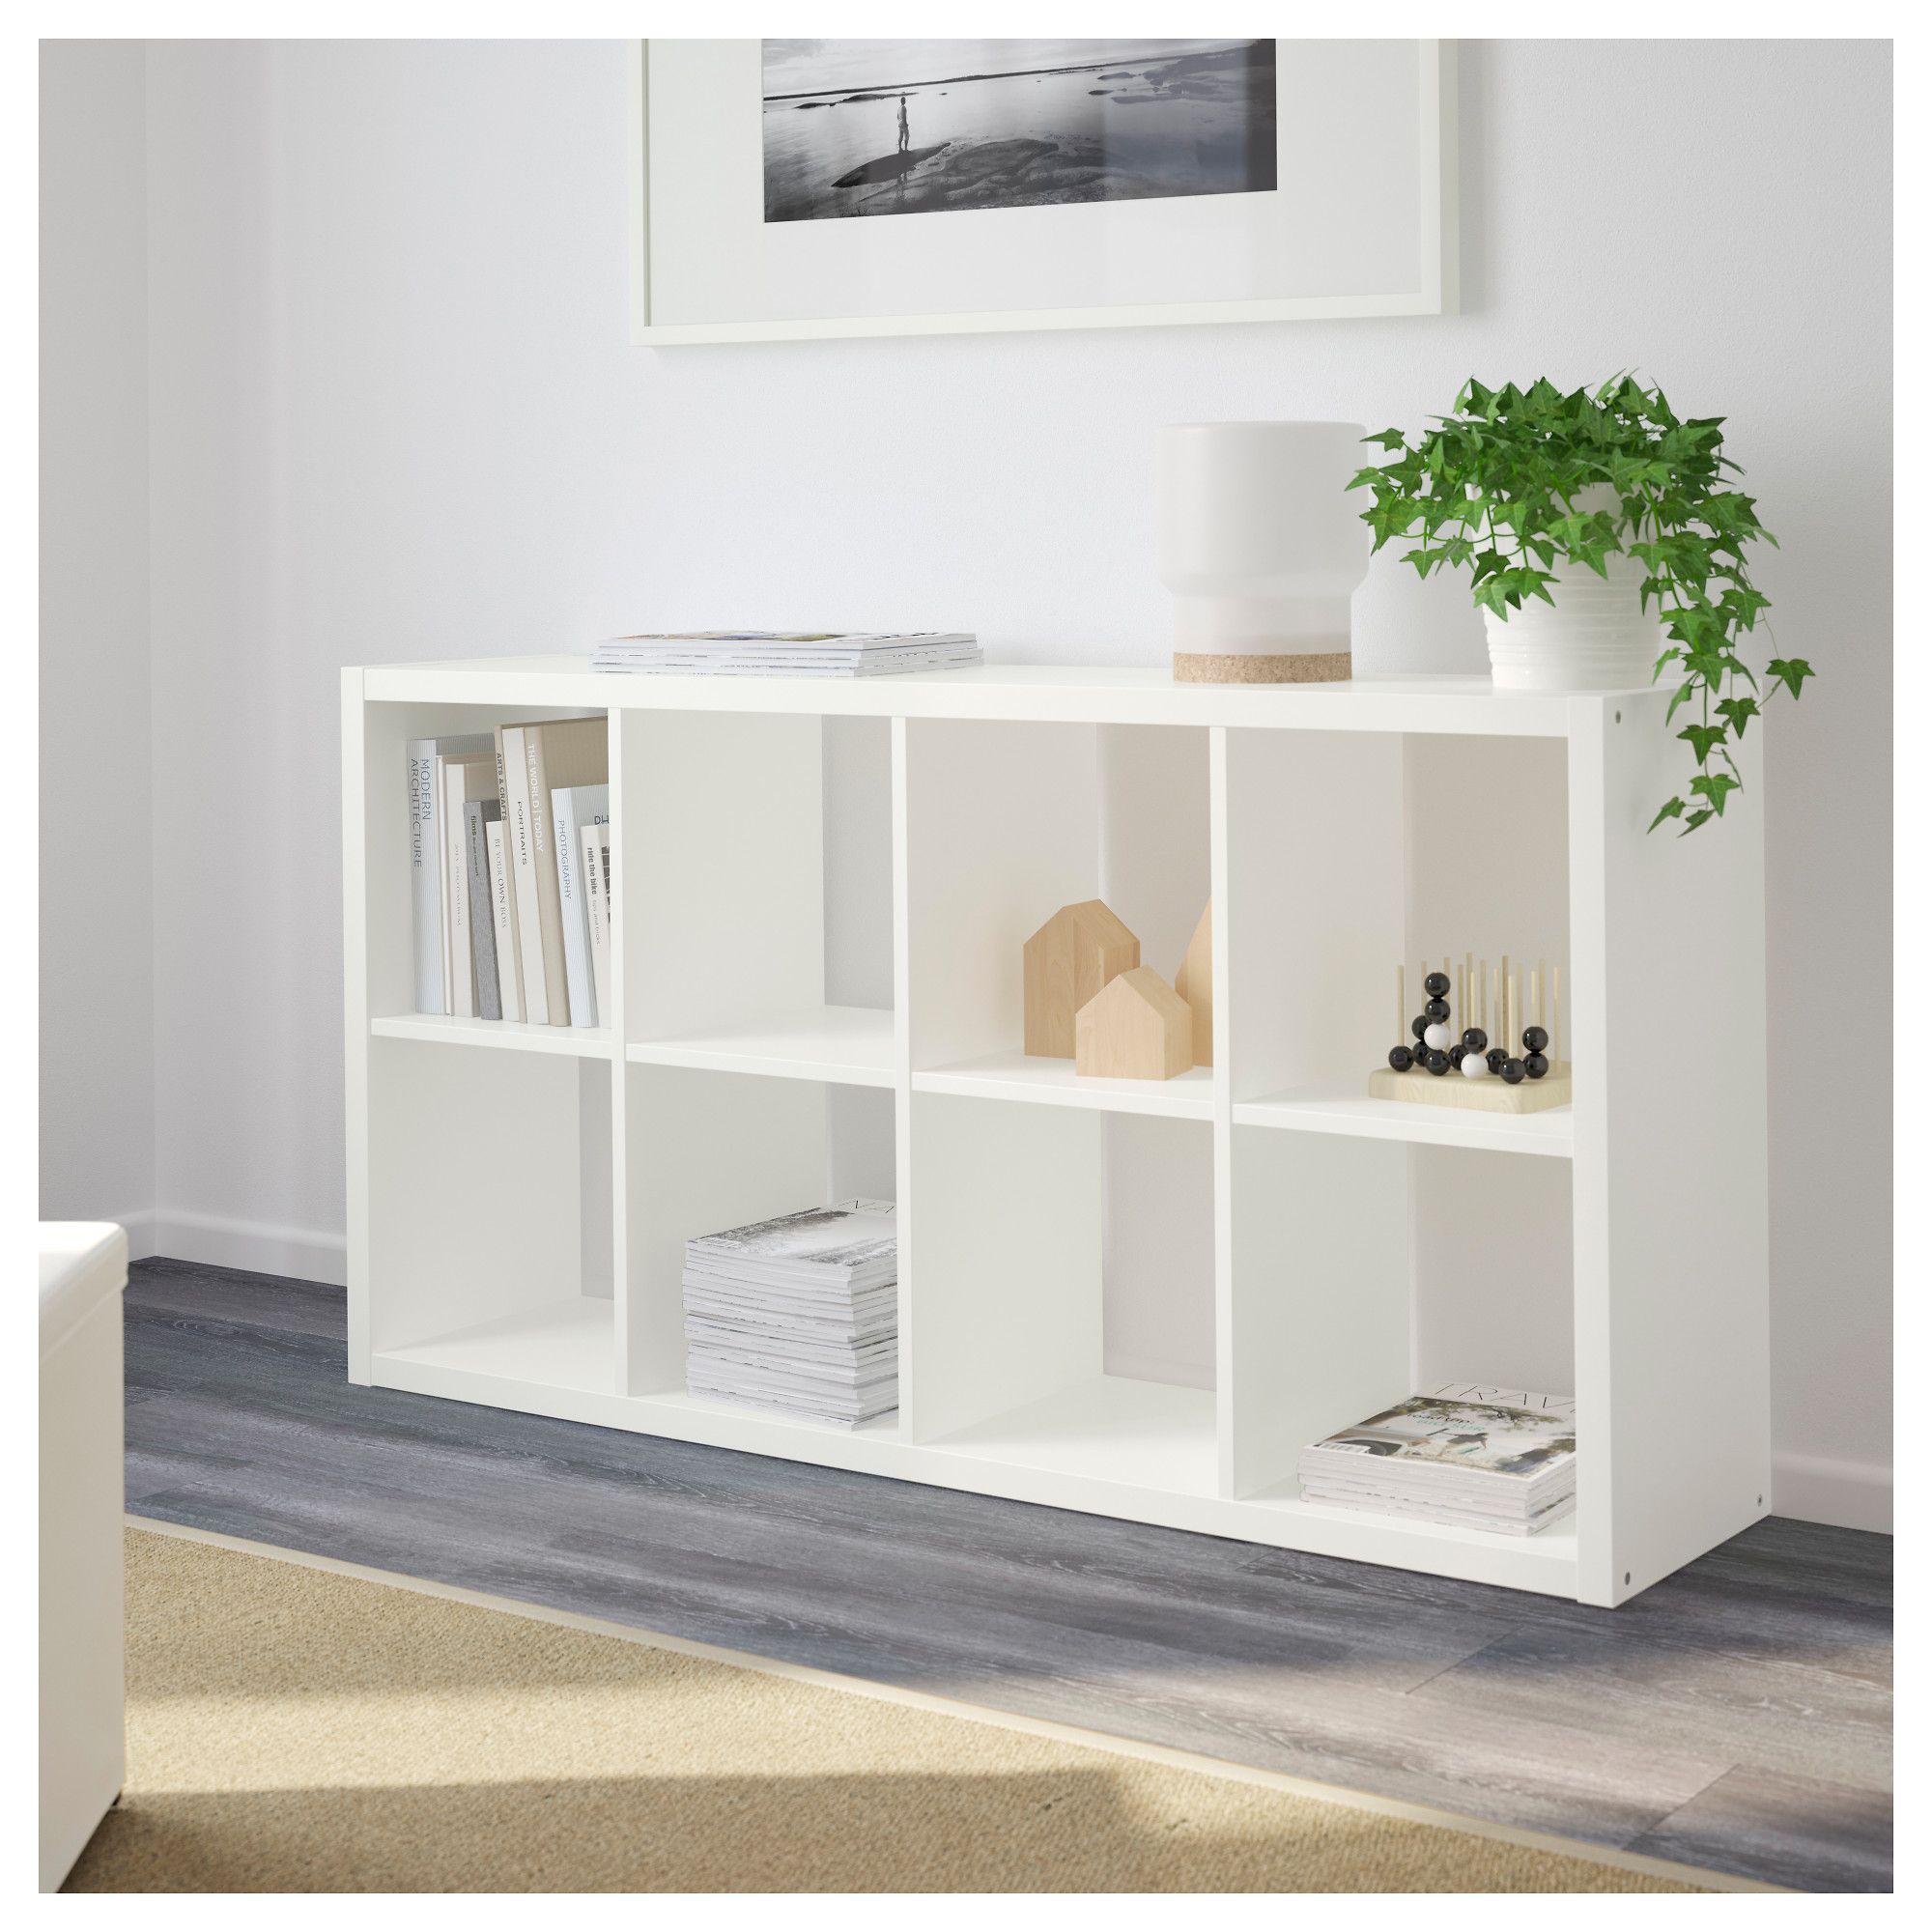 Ikea Flysta White Shelf Unit Ikea Shelving Unit Shelving Unit